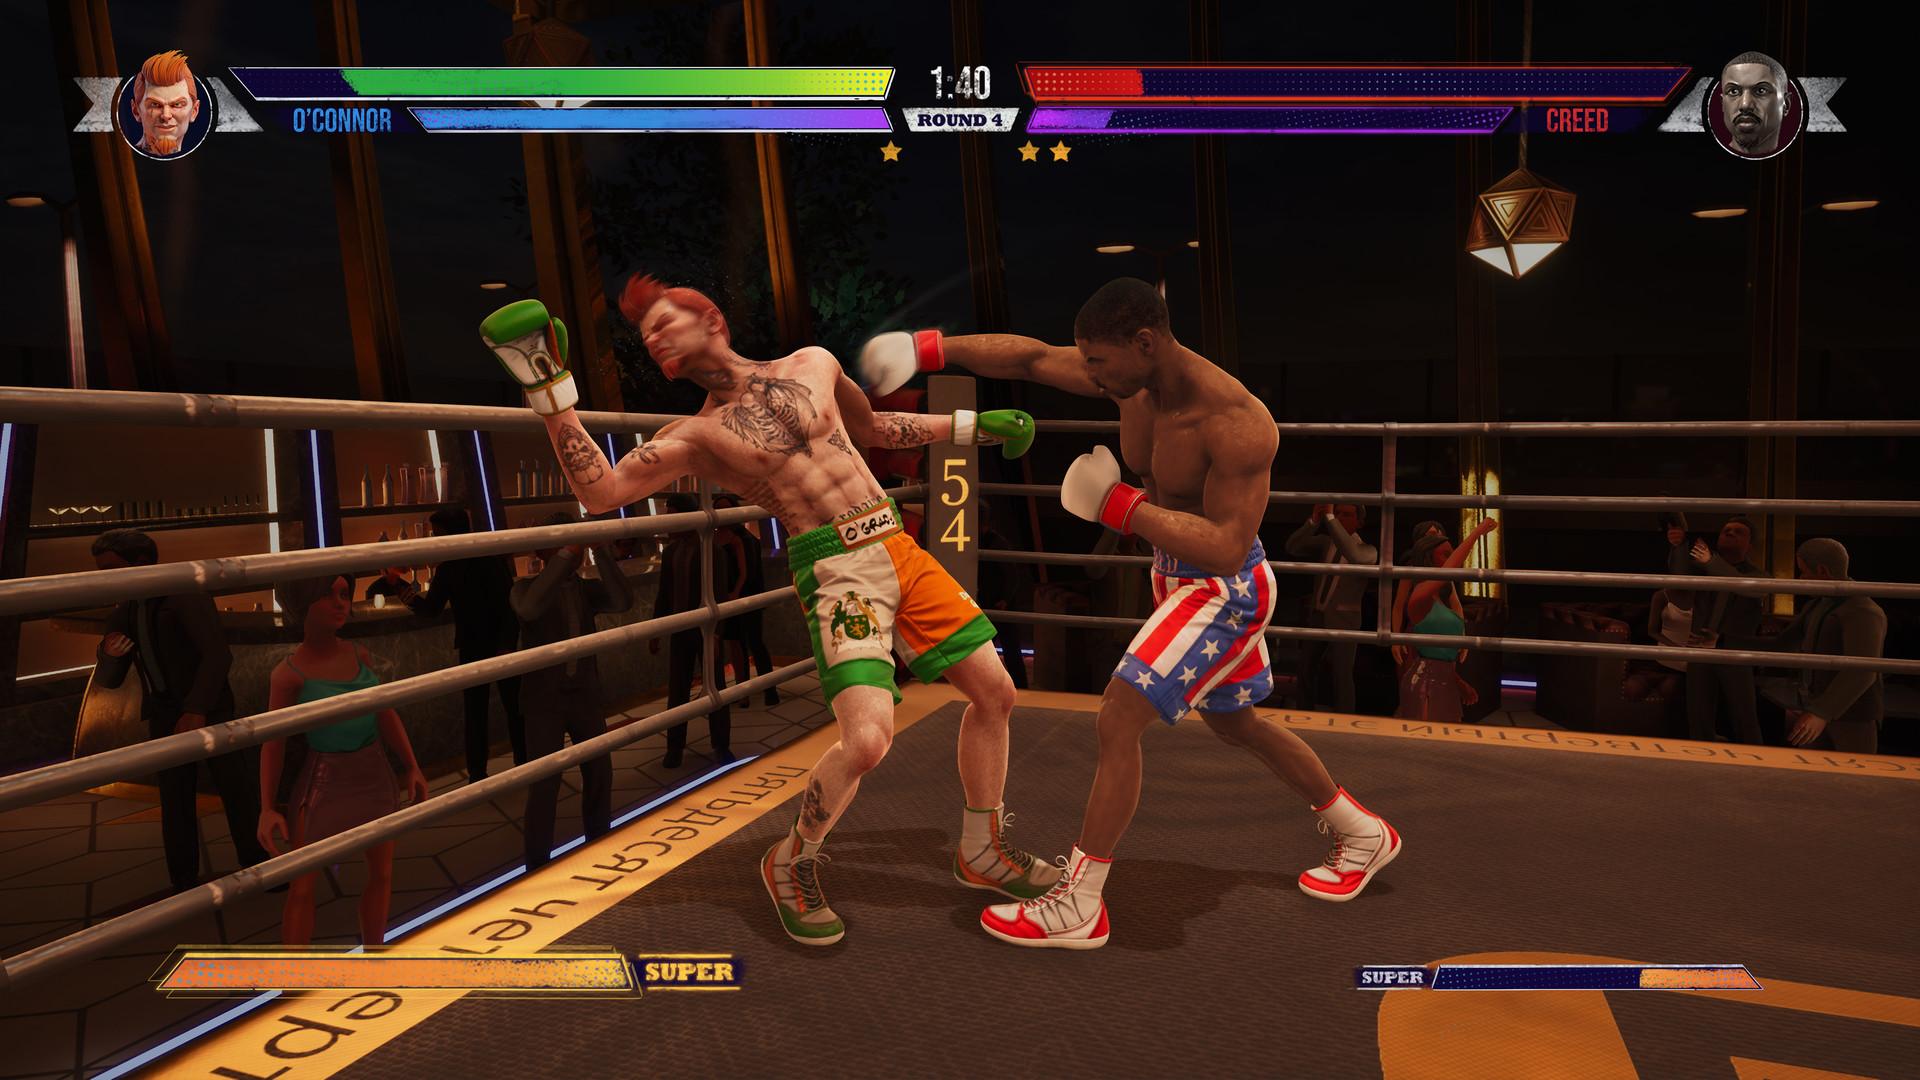 big-rumble-boxing-creed-champions-pc-screenshot-2